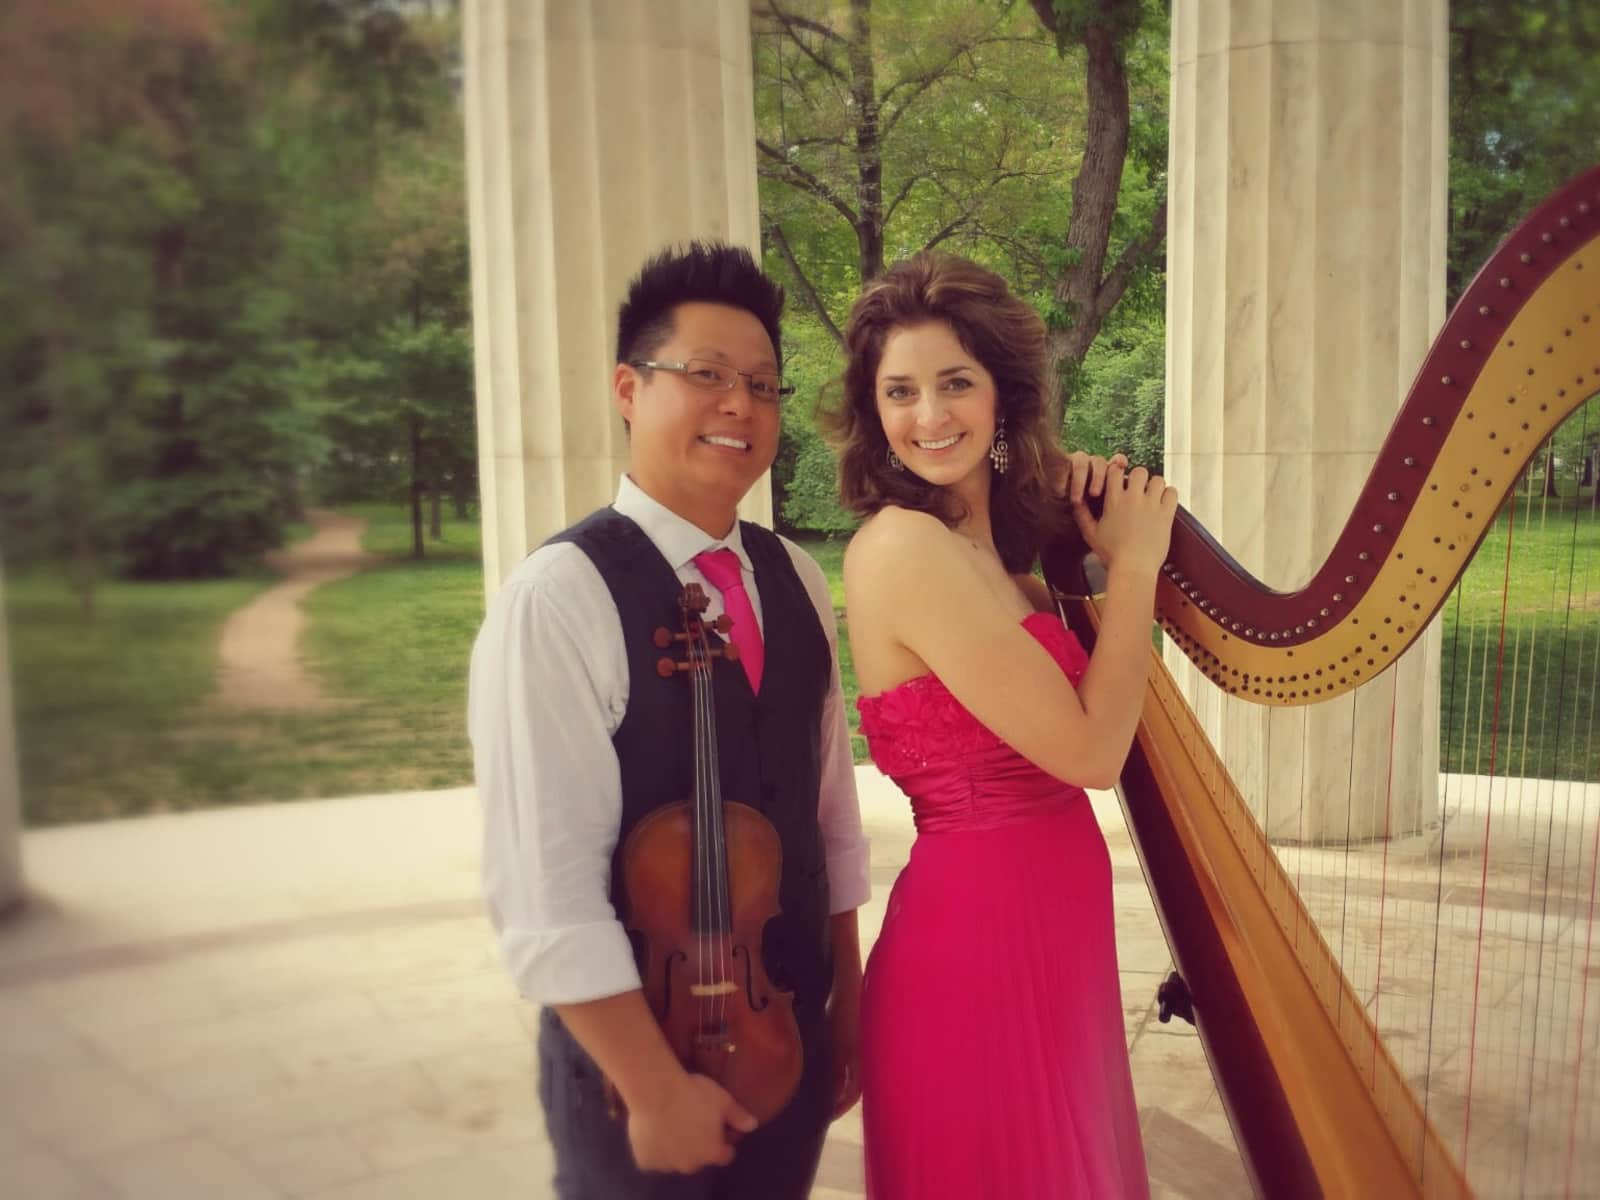 Emily & Benjamin from Fairfax, Virginia, United States